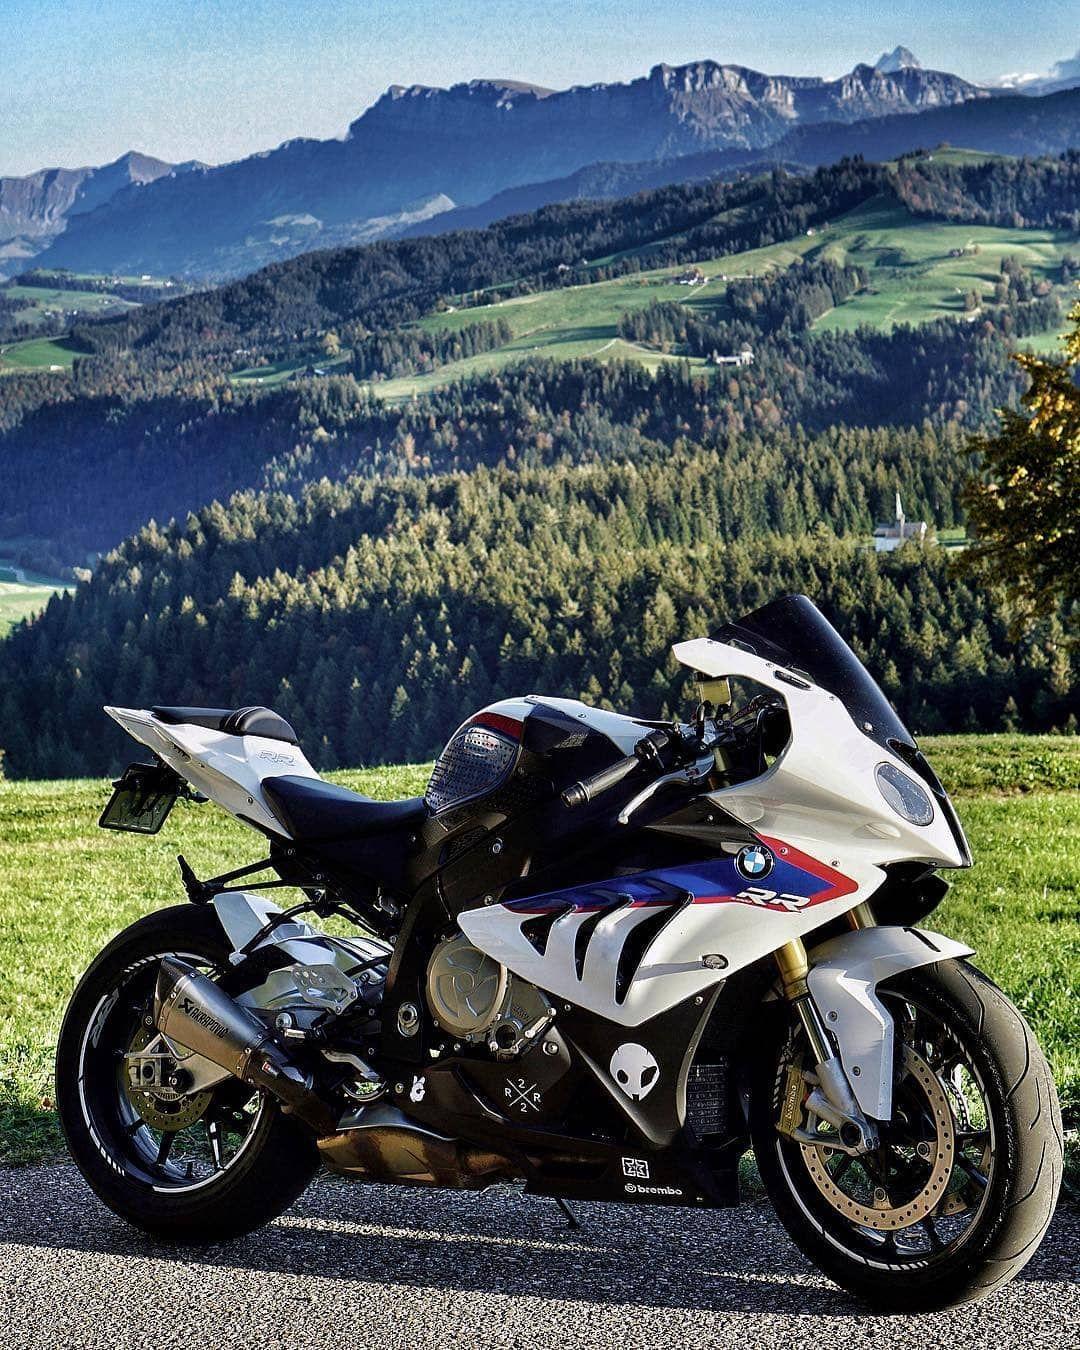 German Quality Owner Gomes Pat Bike Bmw S1000rr Bmws1000rr S1000rr Wer1 Bmwhp4 S1000r Motorcyclelife Yzfr1m Bike Bmw Bmw S1000rr Bmw